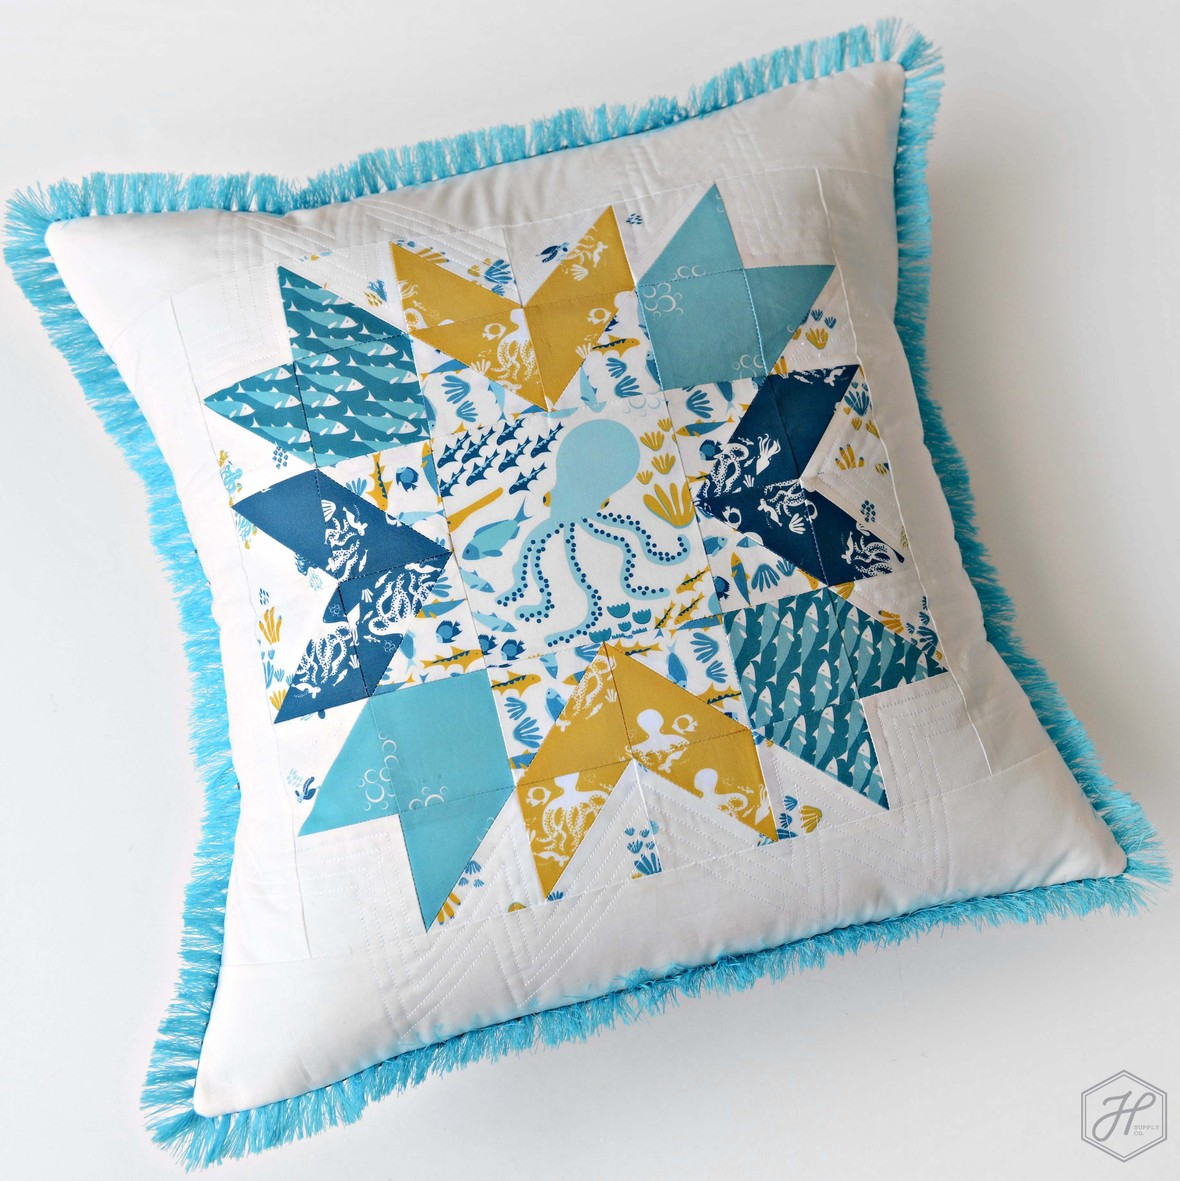 Life Aquatic Patchwork Pillow Marina Grzanka for Hawthorne Supply Co - Copy